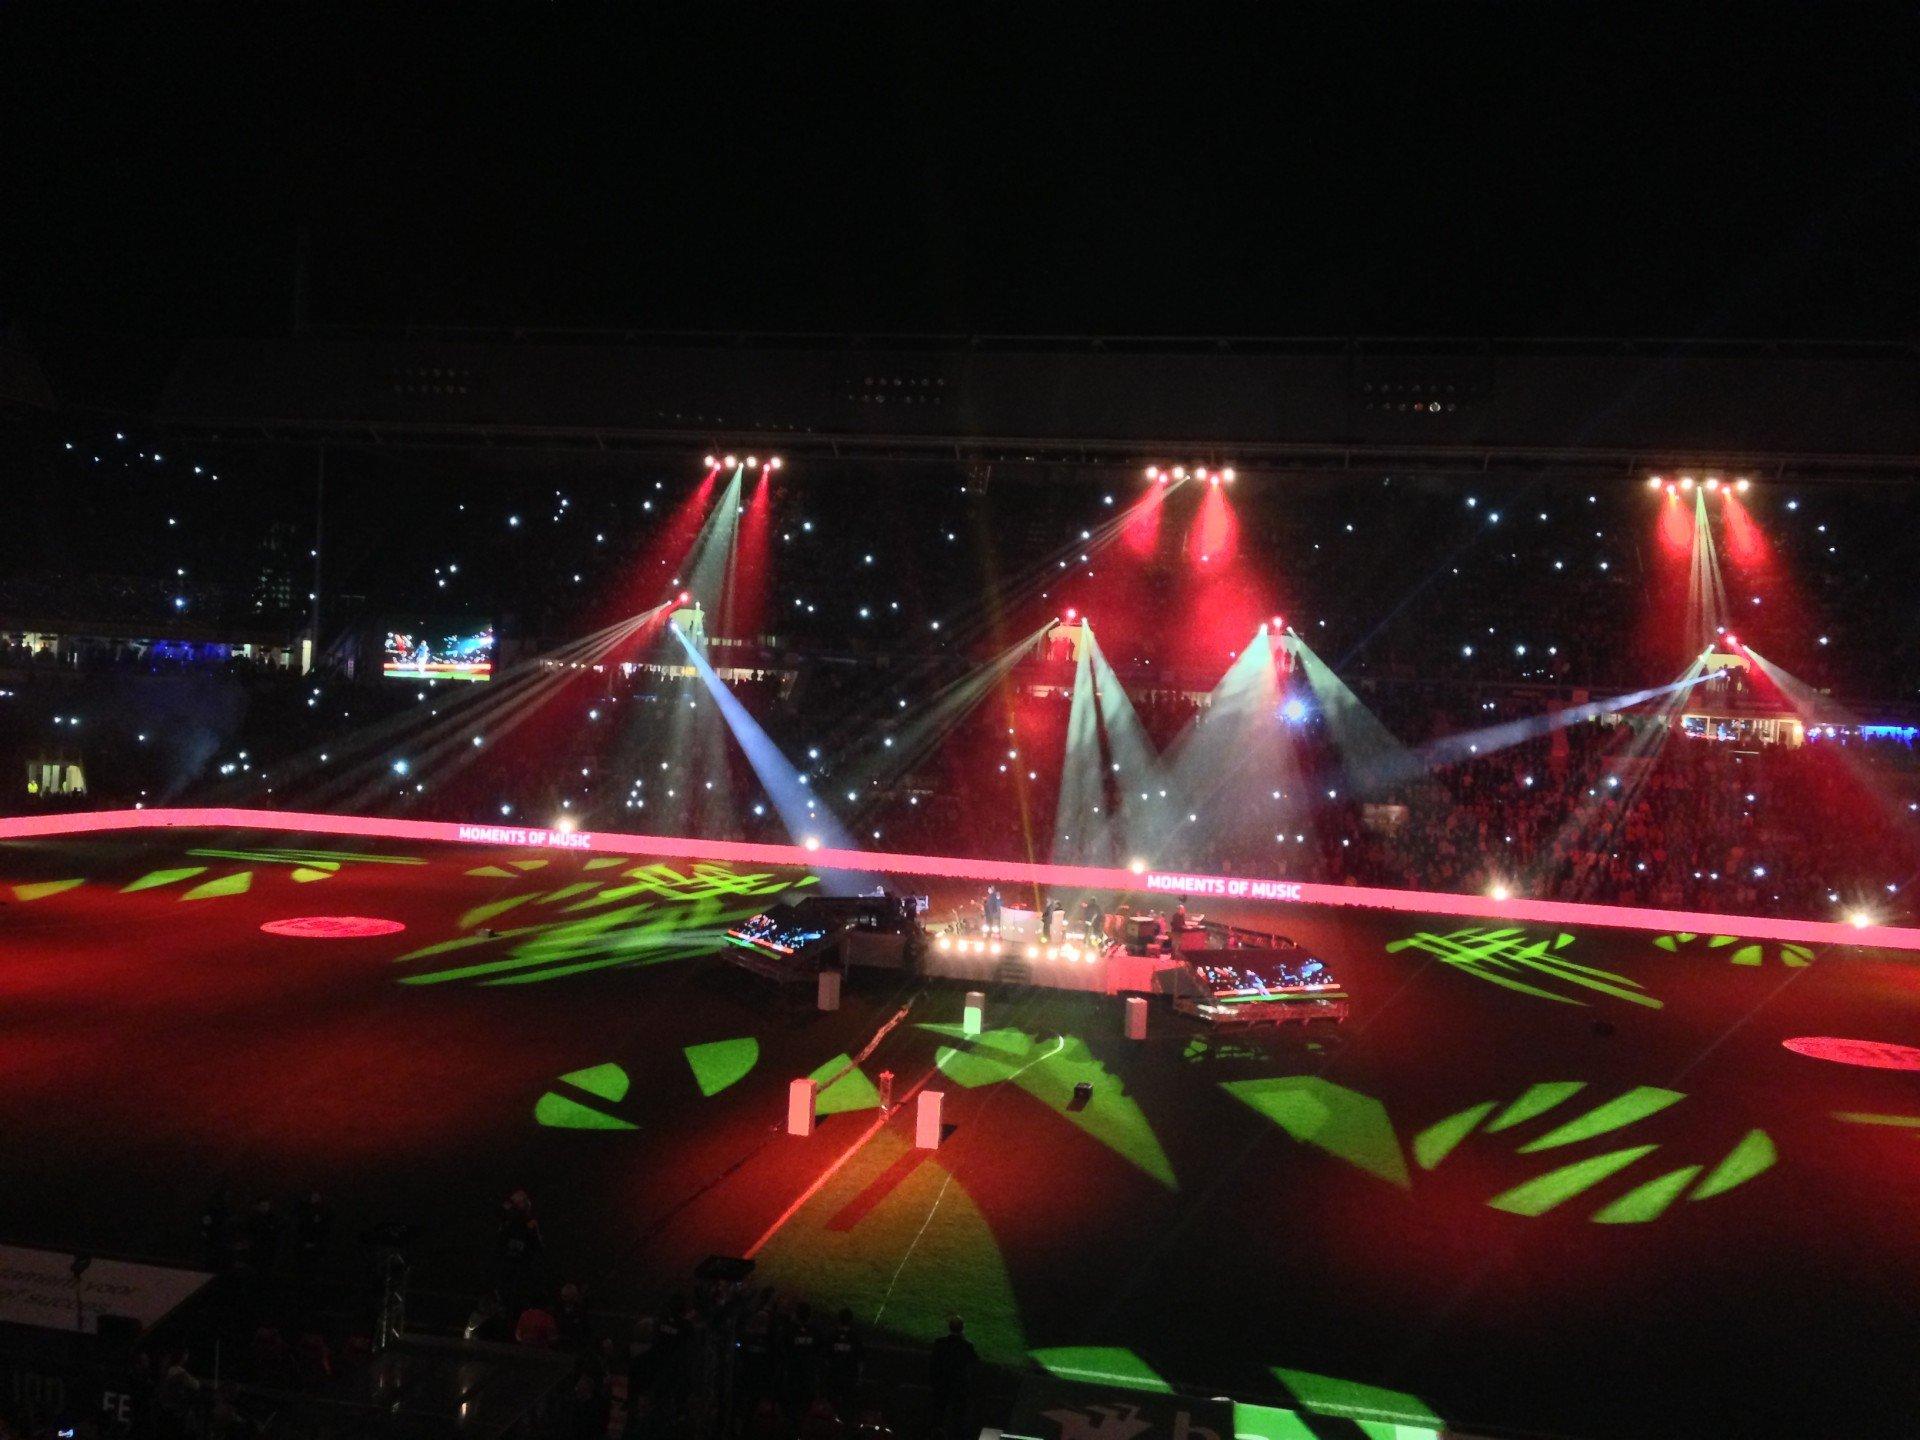 PSV 100 years